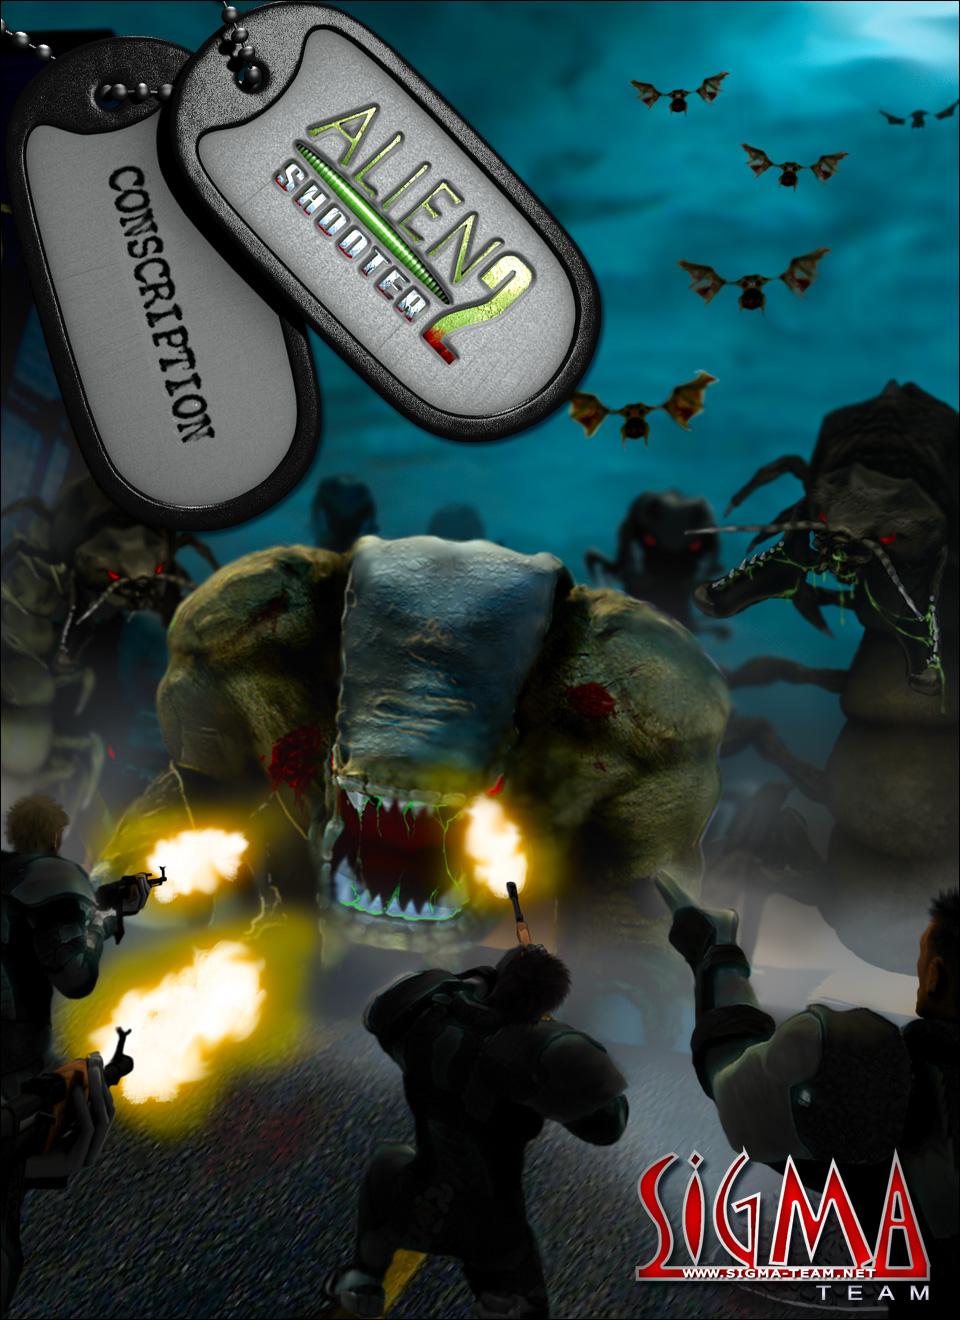 Hướng dẫn chơi game Alien Shooter 2 Conscription mission 6